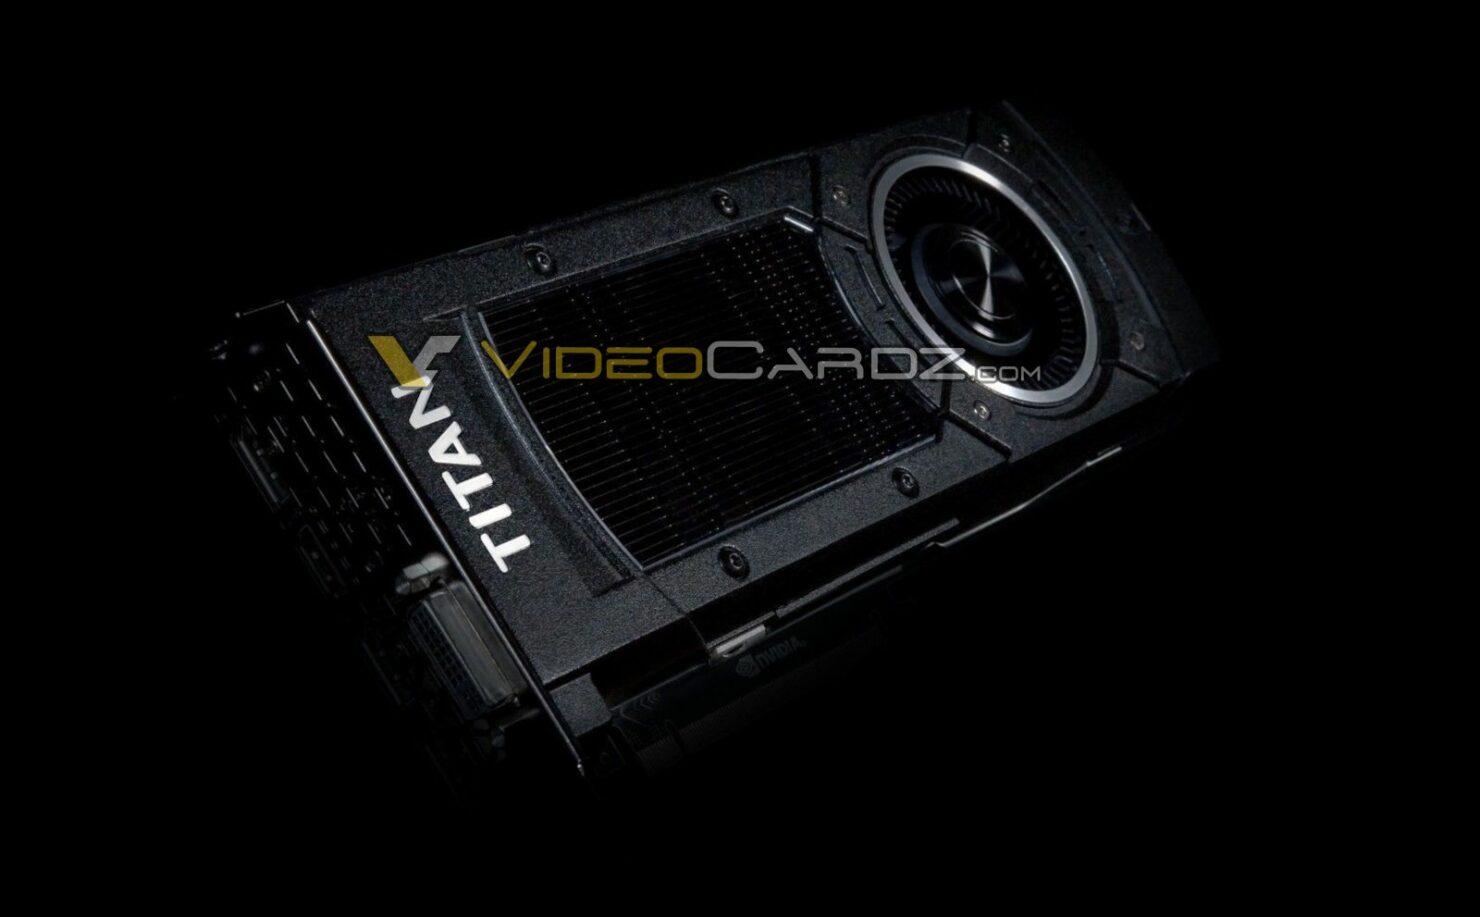 nvidia-geforce-gtx-titan-x_beauty-shots_3